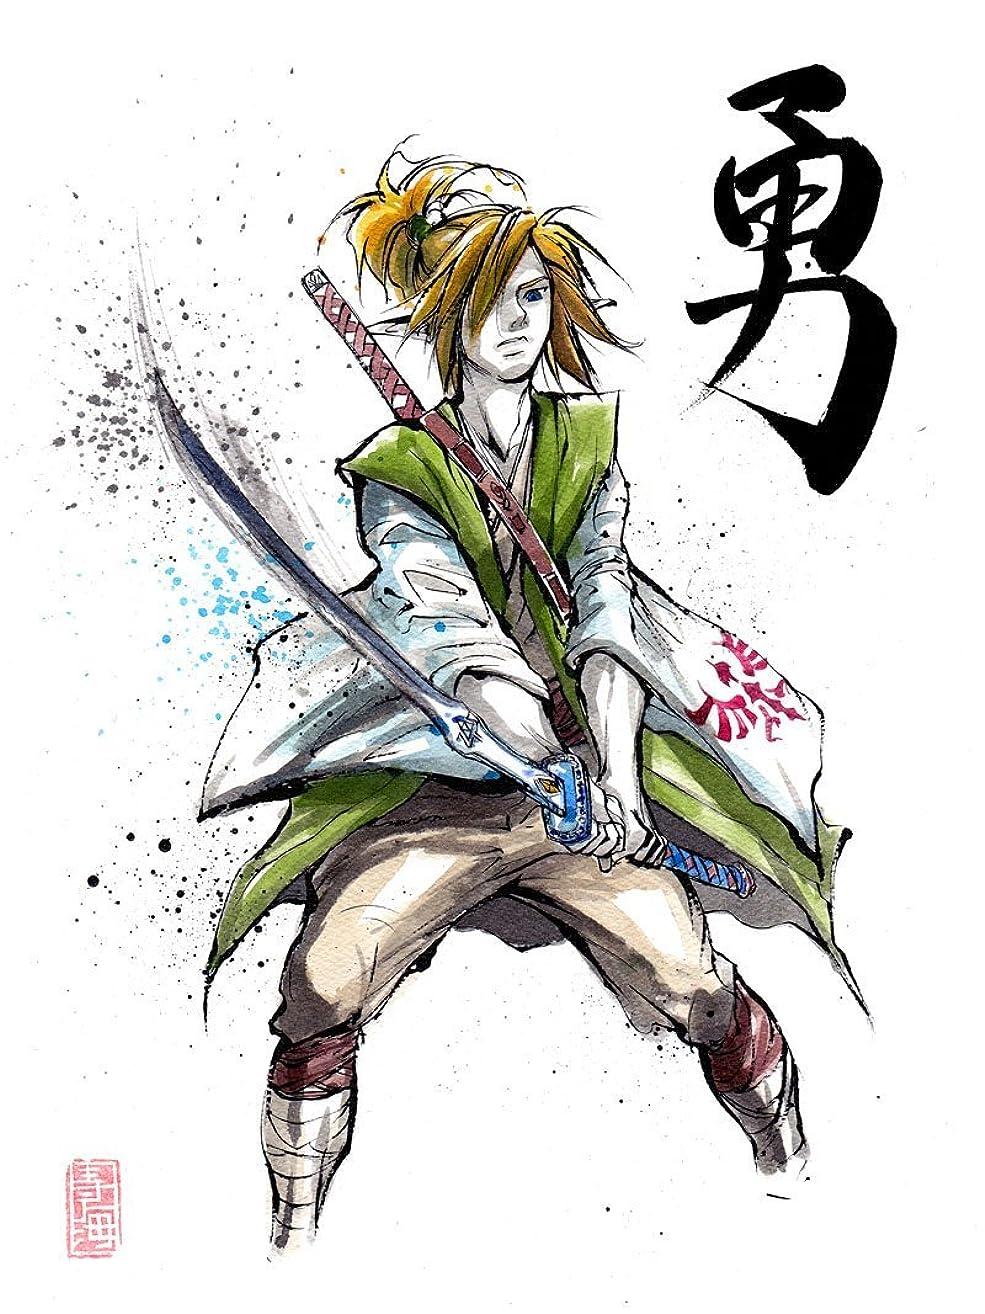 8x10 PRINT of Samurai Link Japanese Calligraphy COURAGE